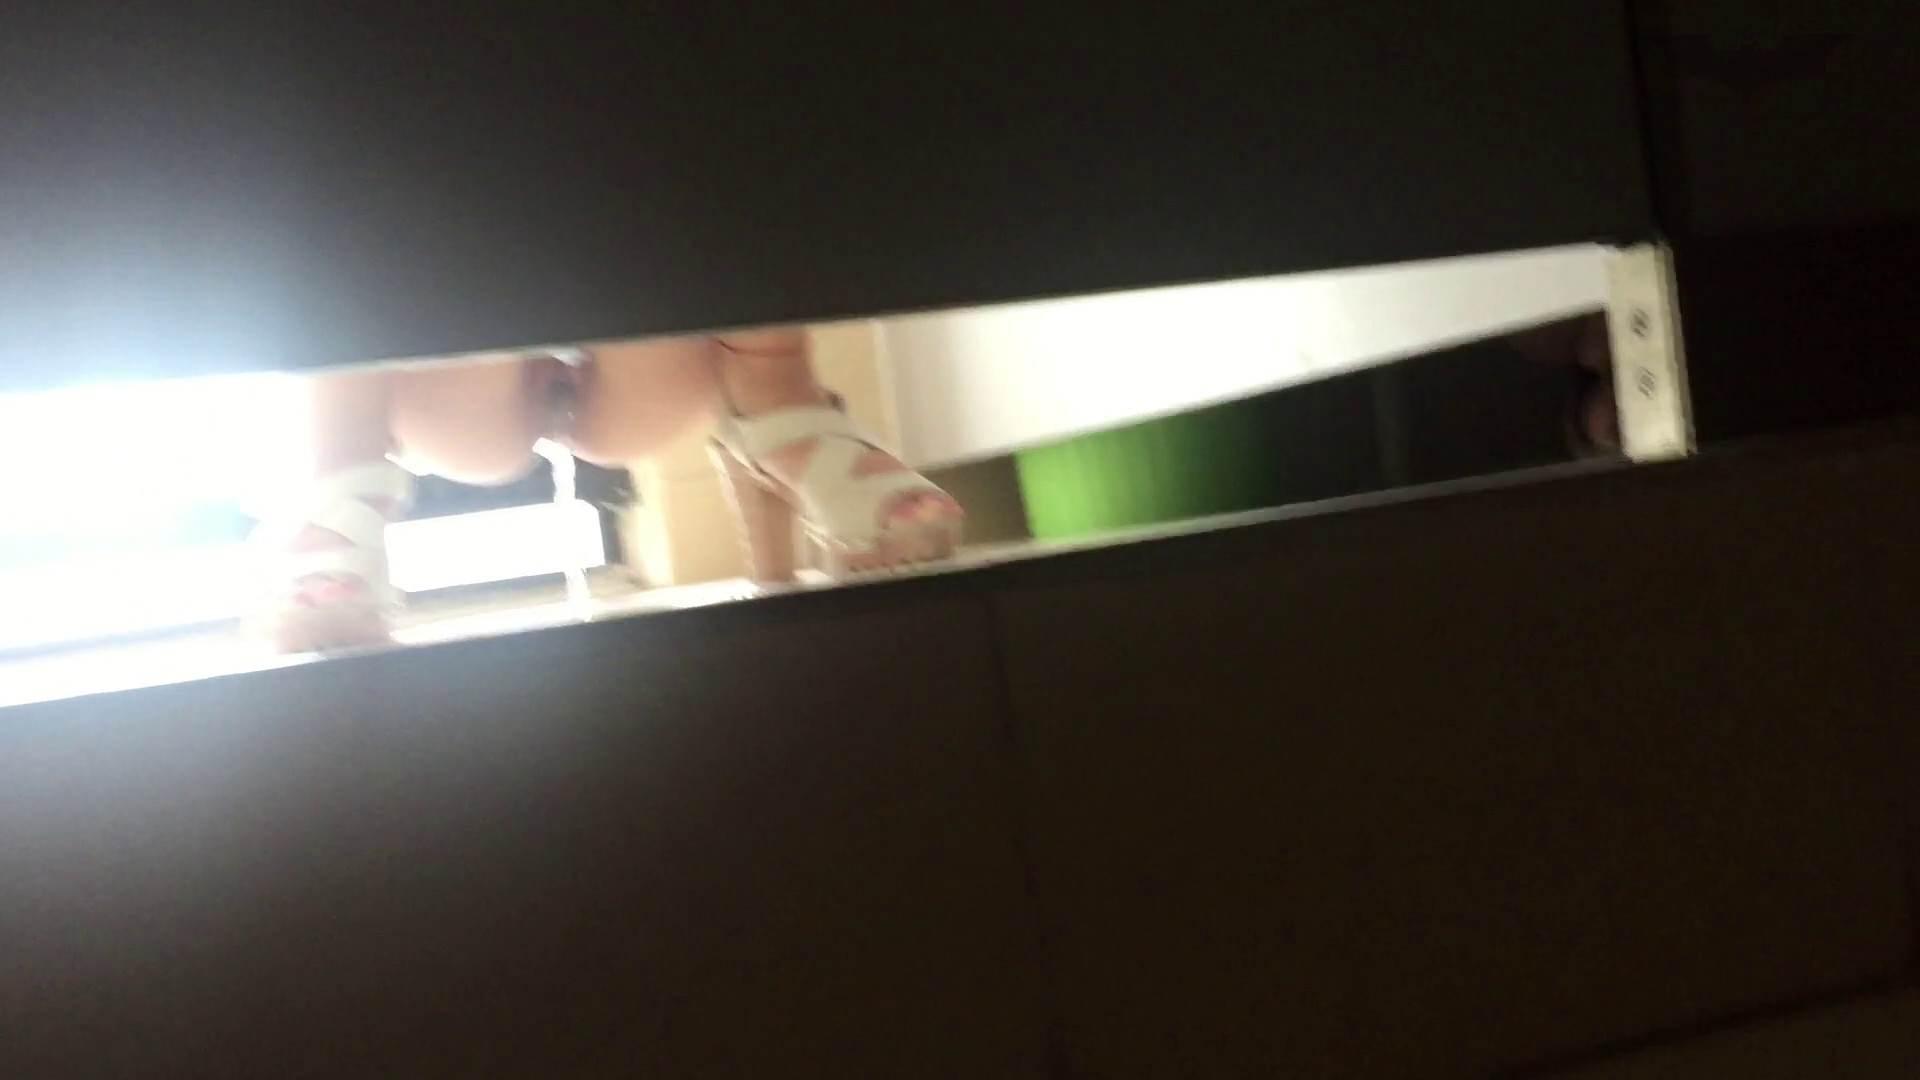 JD盗撮 美女の洗面所の秘密 Vol.73 細身・スレンダー AV無料動画キャプチャ 67画像 55